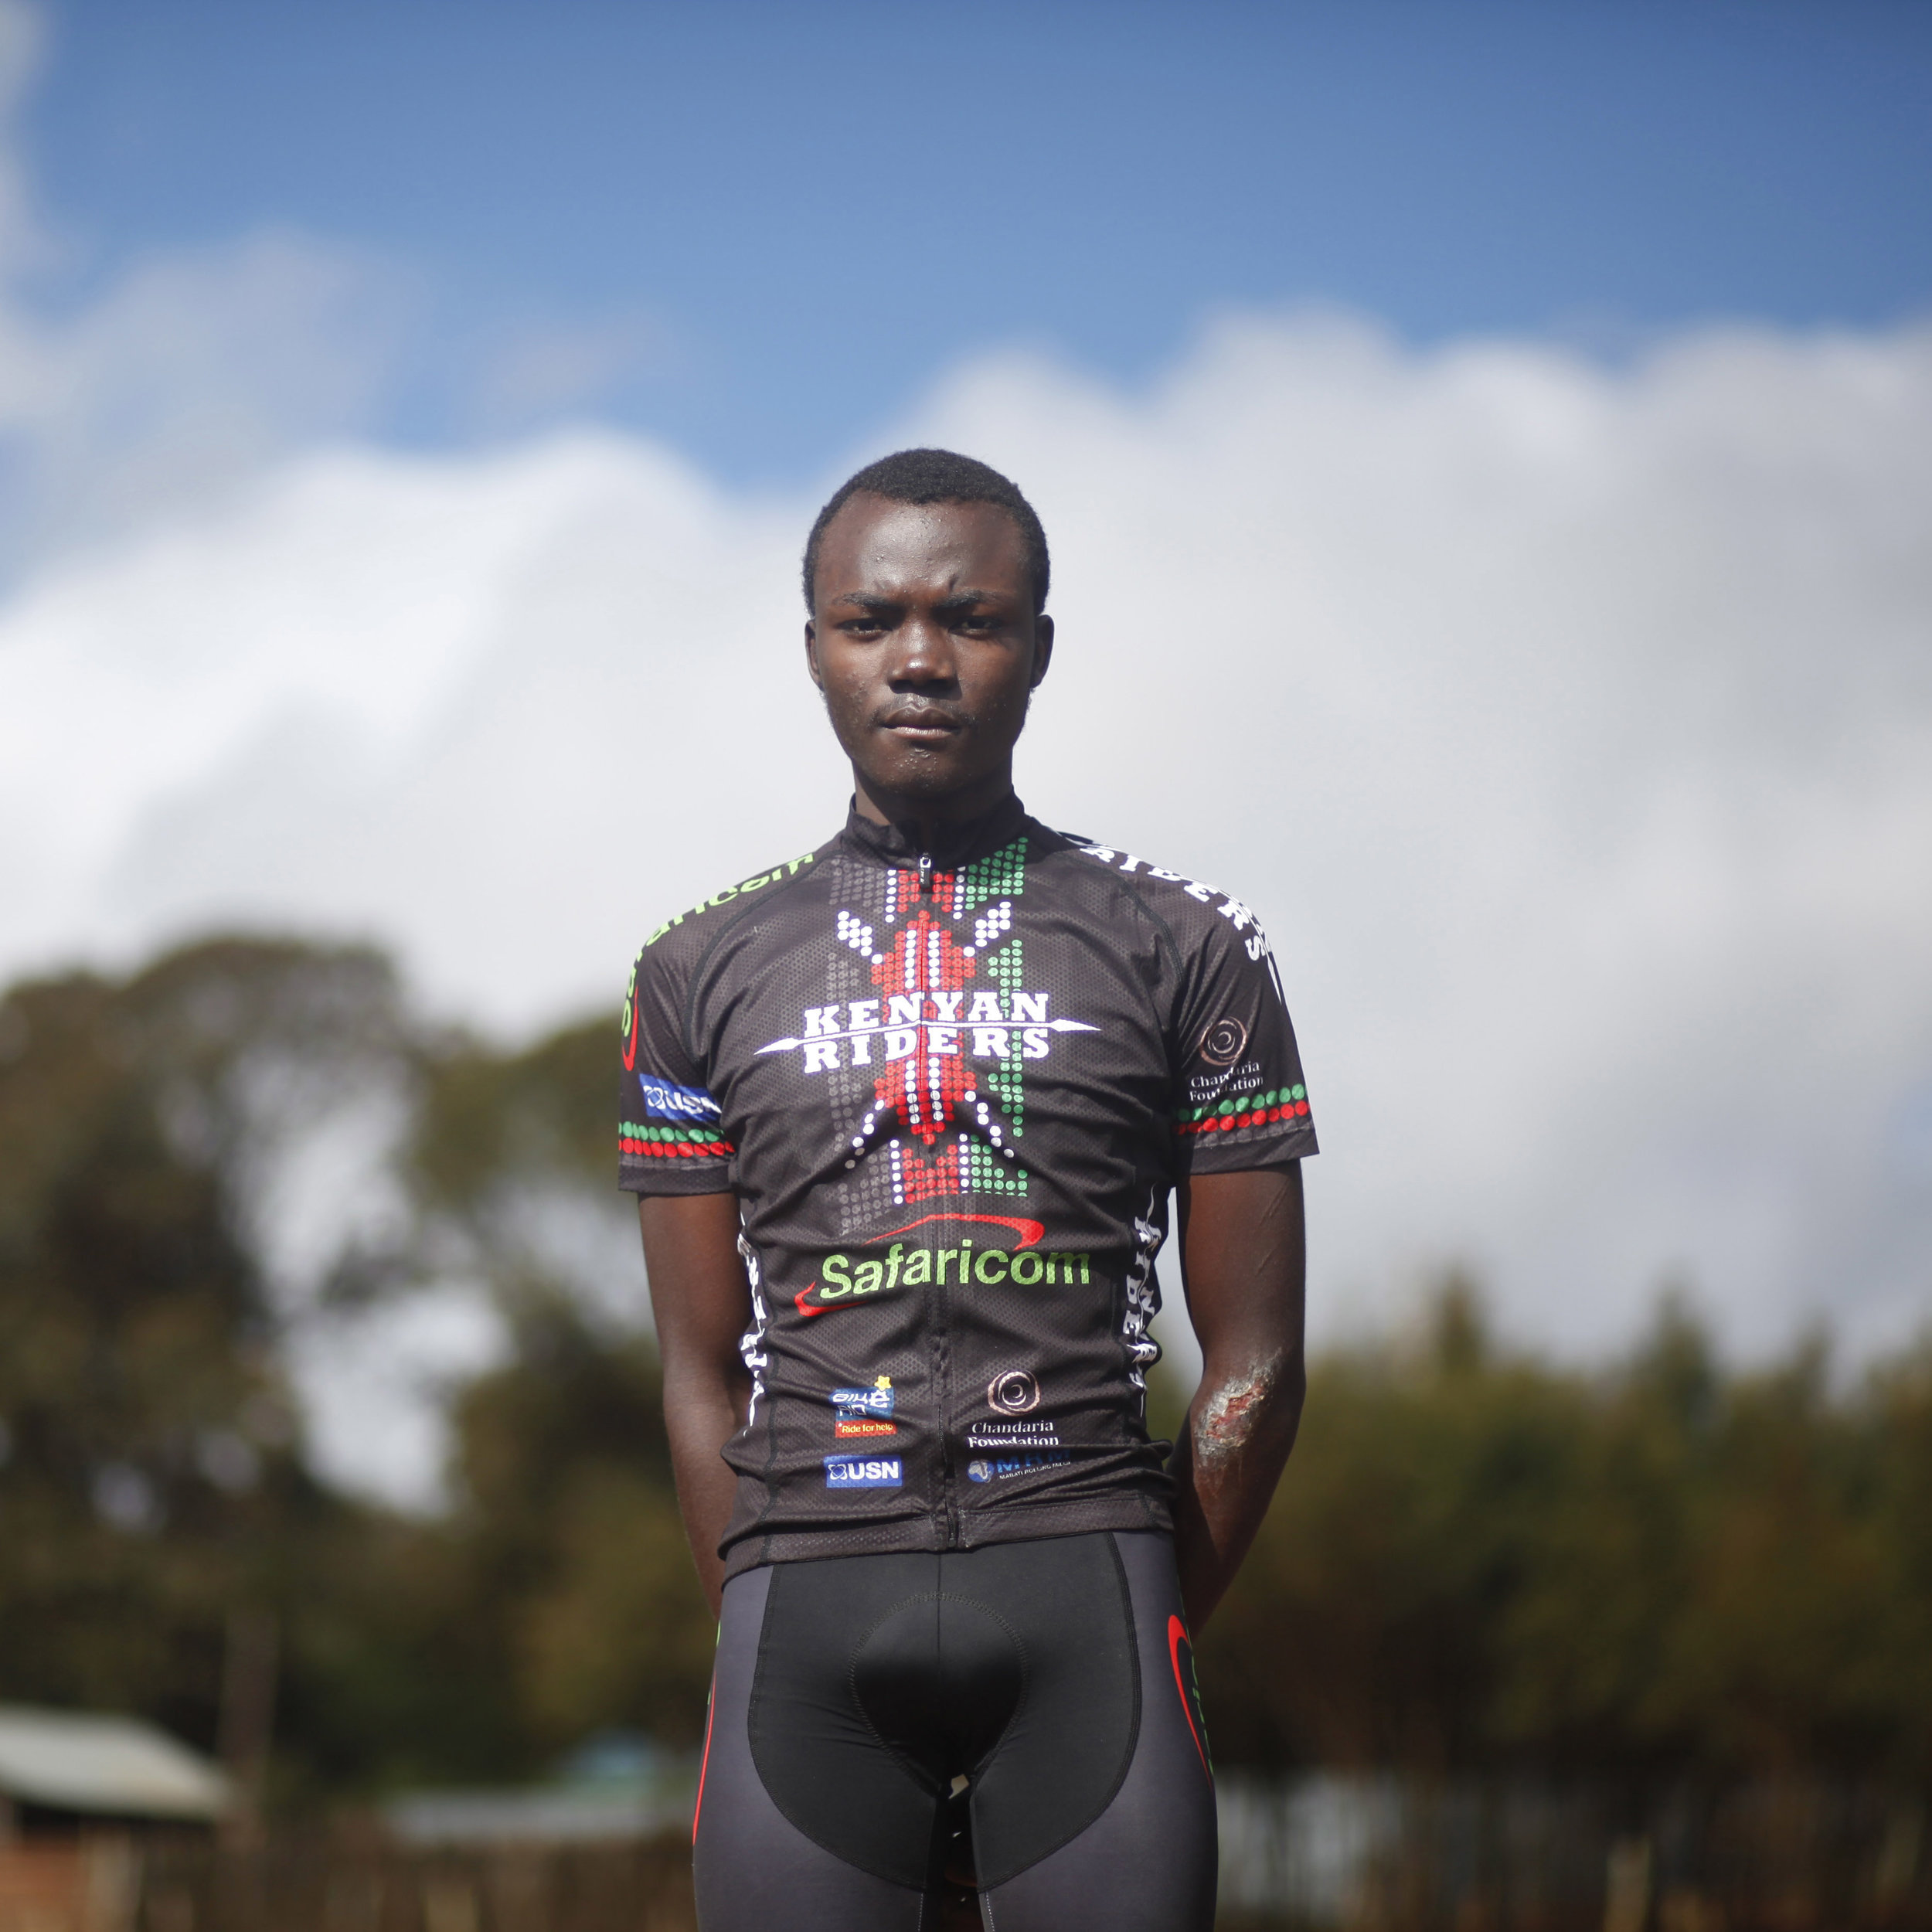 Kariuki. Our Nakuru pioneer.